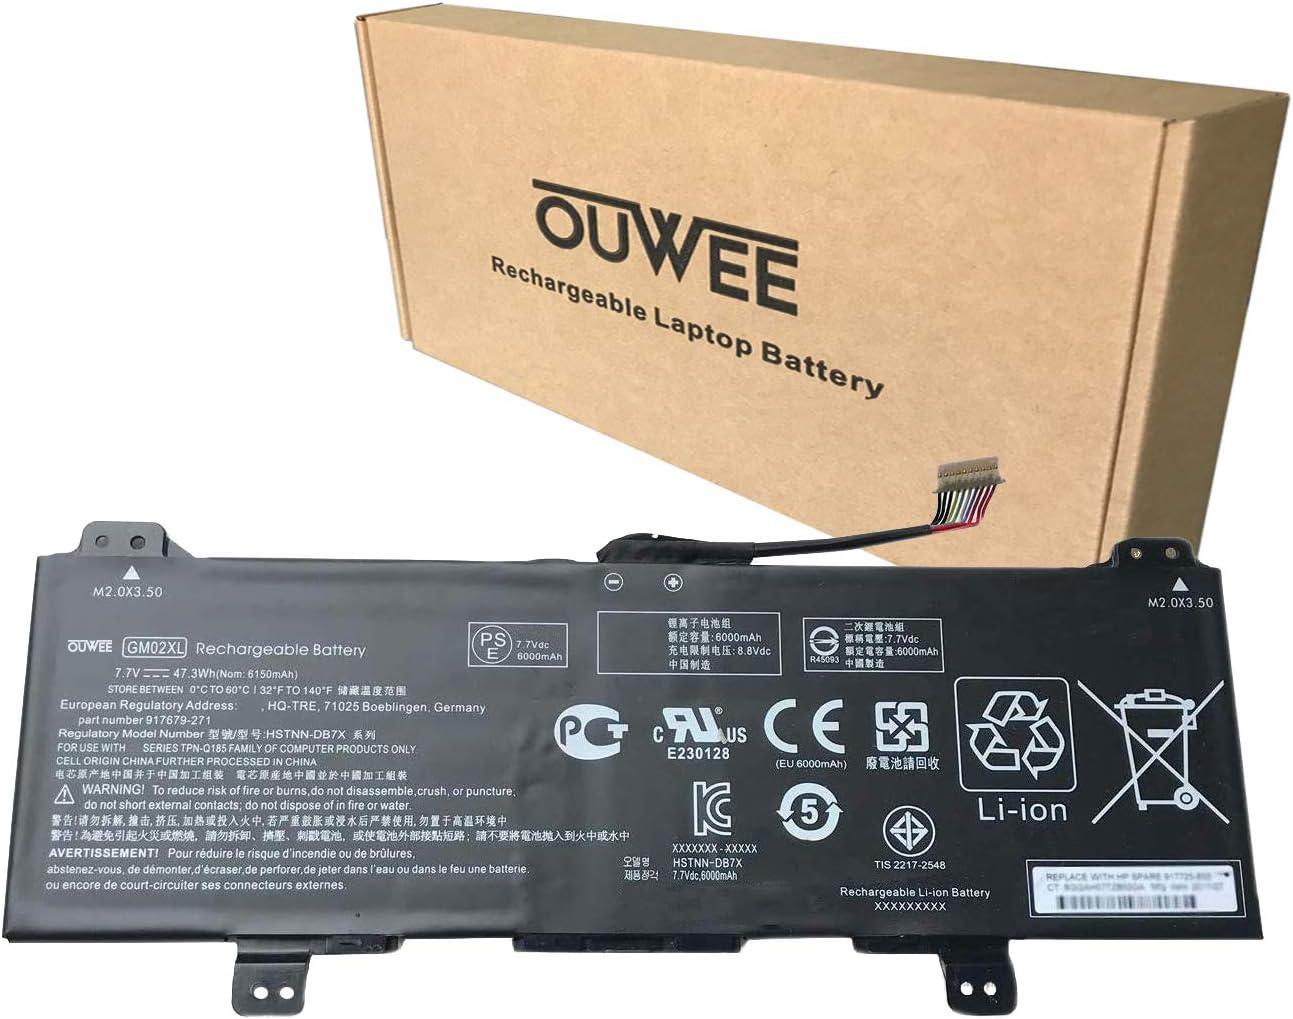 OUWEE GM02XL Laptop Battery Compatible with HP Chromebook 14 G5 Chromebook X360 11 G1 Series Notebook GMO2XL HSTNN-DB7X HSTNN-UB7M 917679-271 917725-855 7.7V 47.3Wh 6150mAh